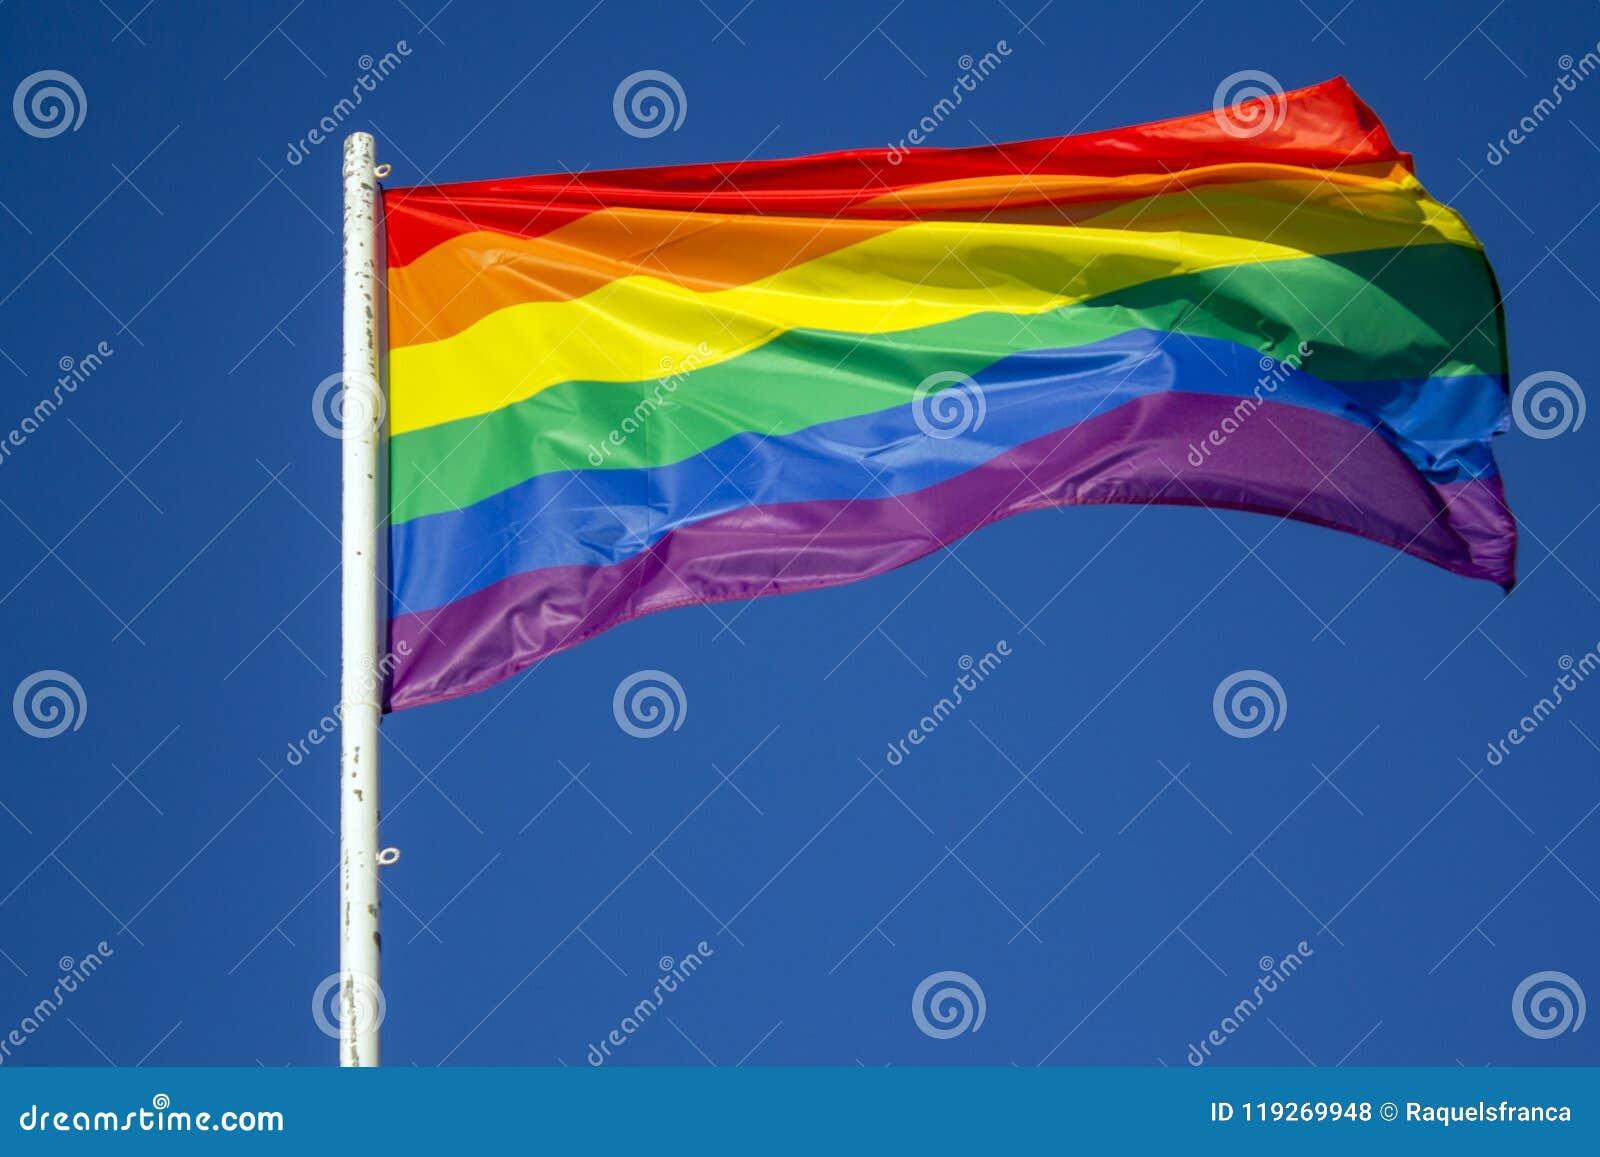 LGBT-Regenbogen-Stolzflagge gegen blauen Himmel